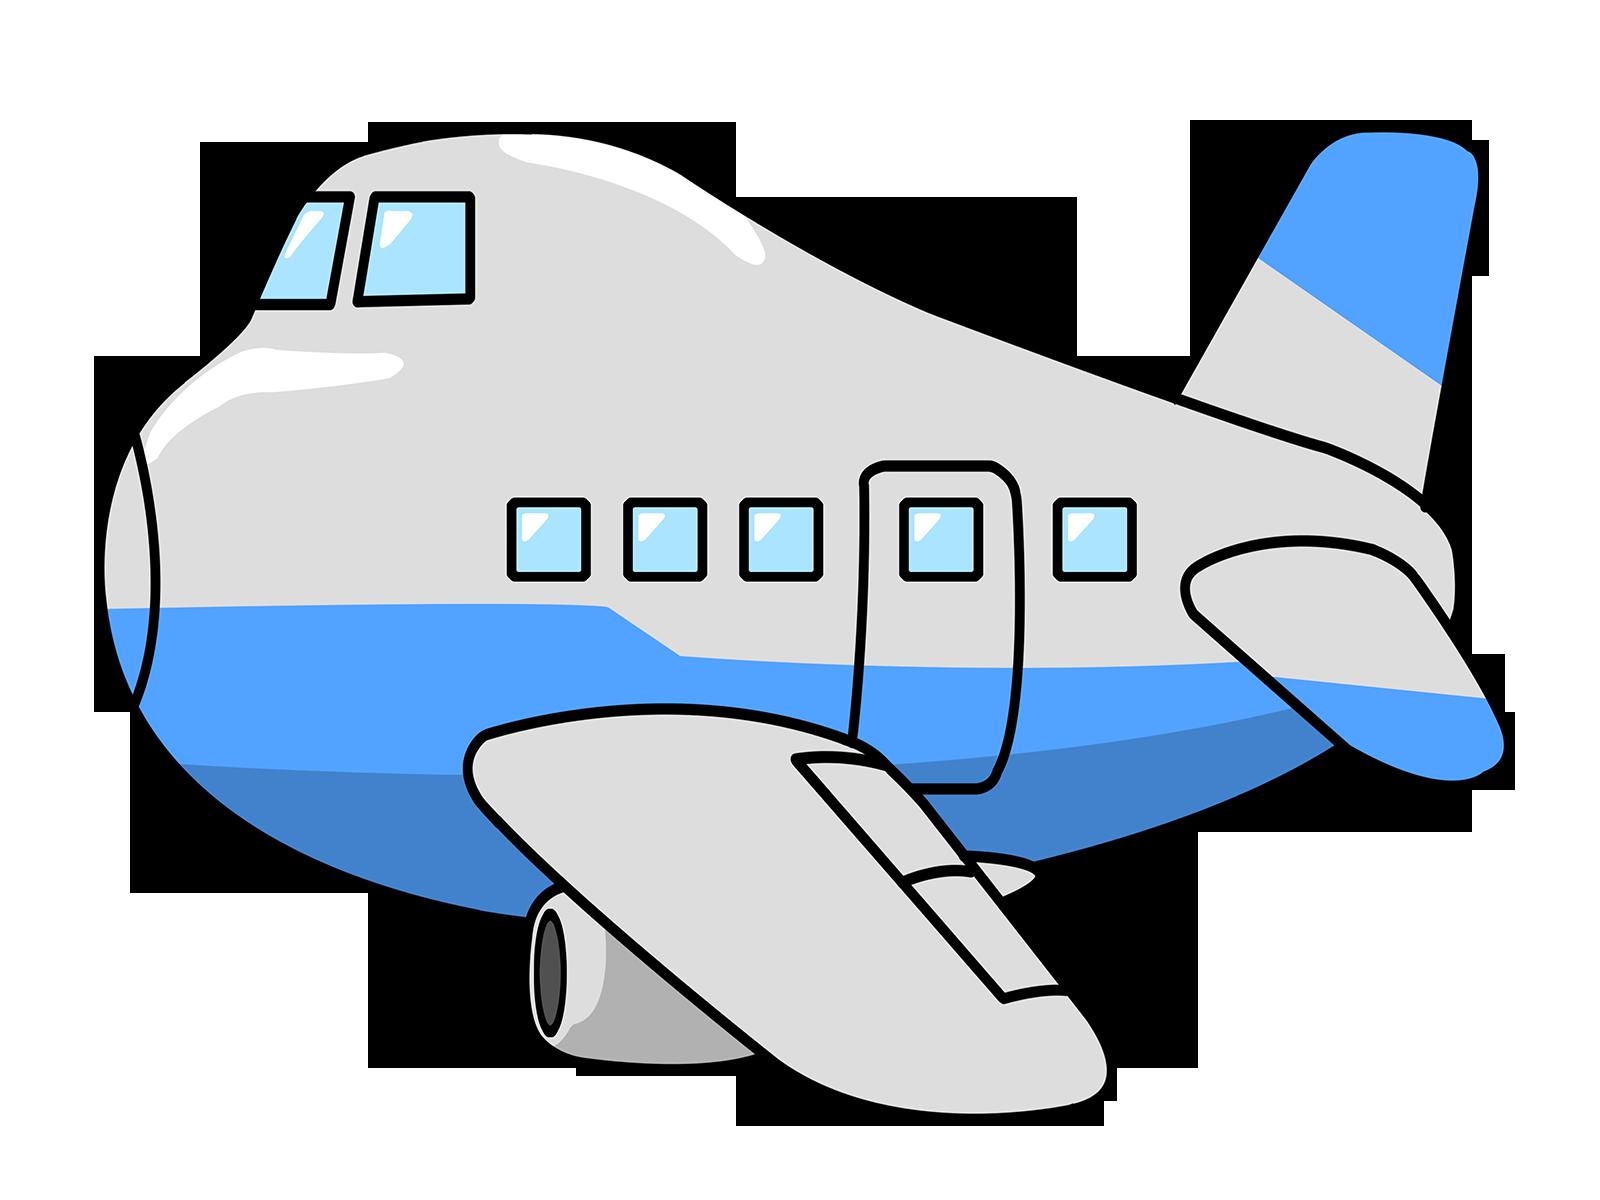 1600x1200 Clip Art Plane